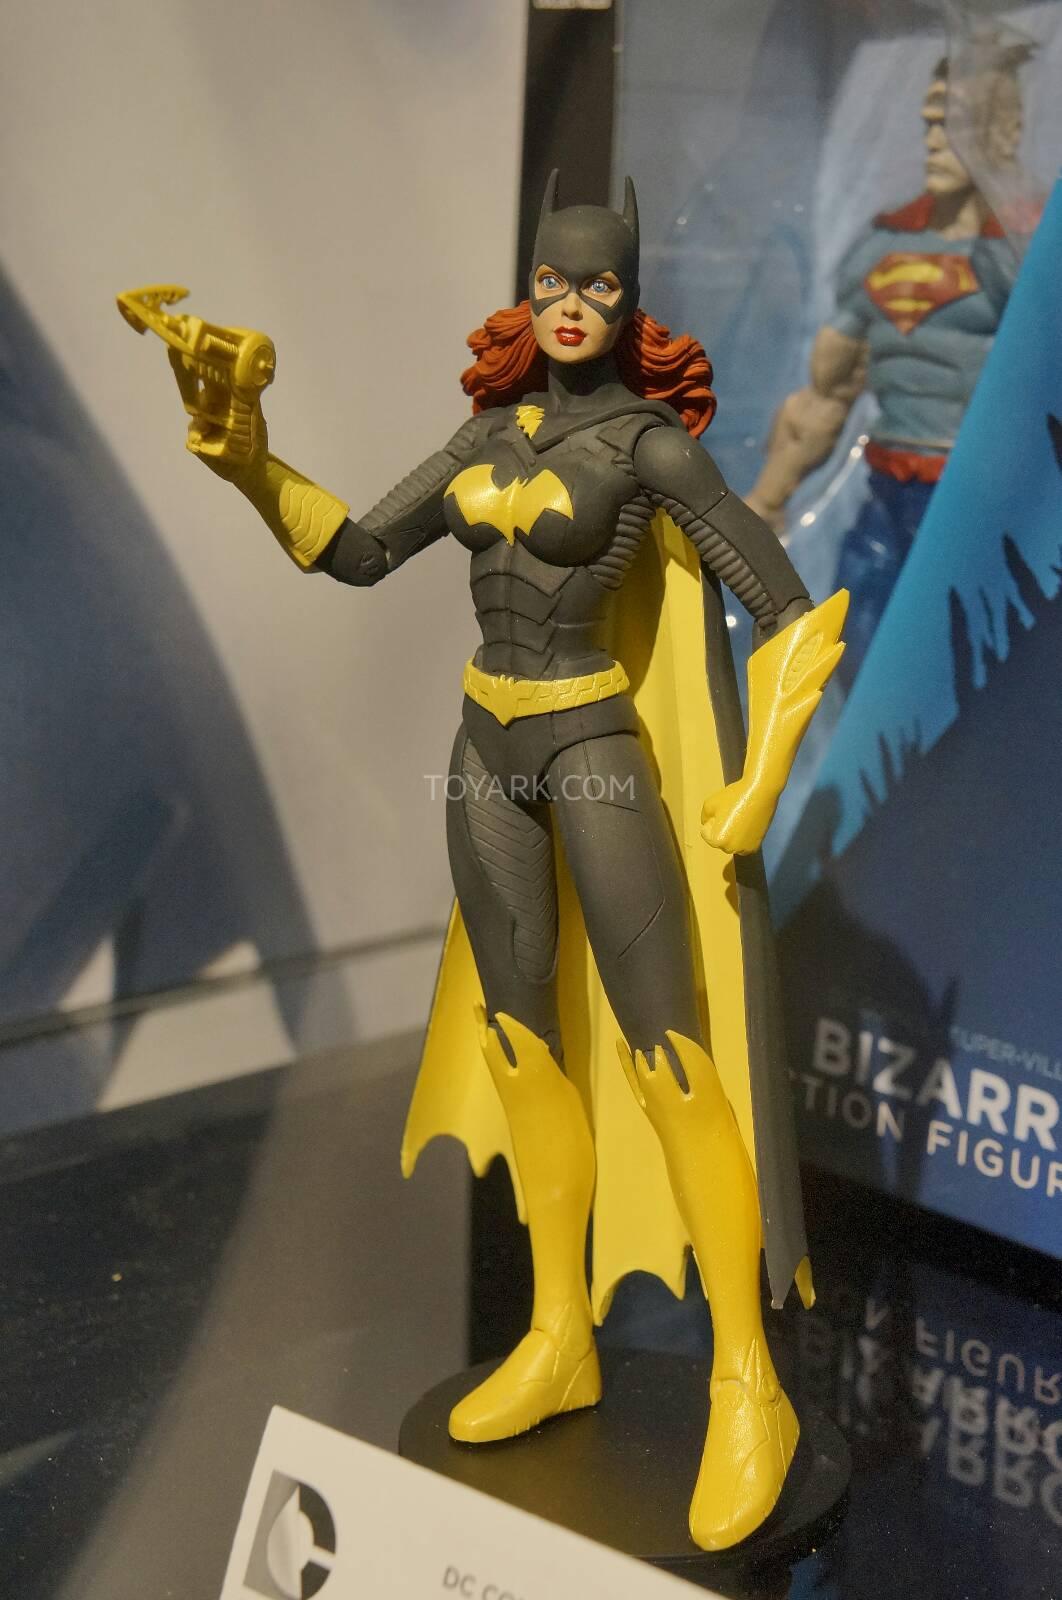 [Toy Fair 2014] DC Collectibles Toy-Fair-2014-DC-Collectibles-123